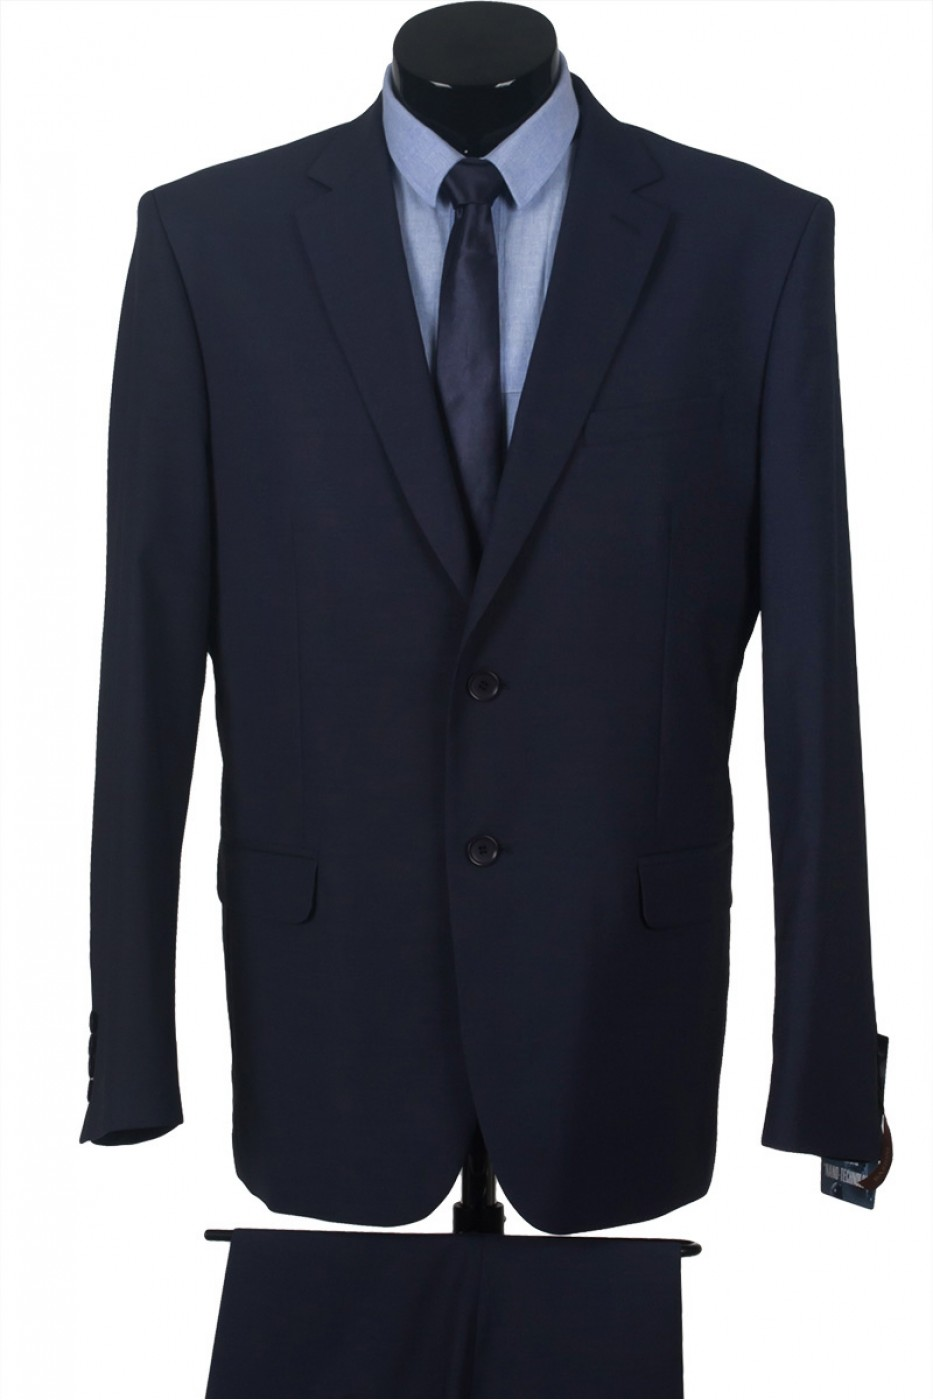 Тёмно-синий мужской костюм 1121*M BUSTO LUX